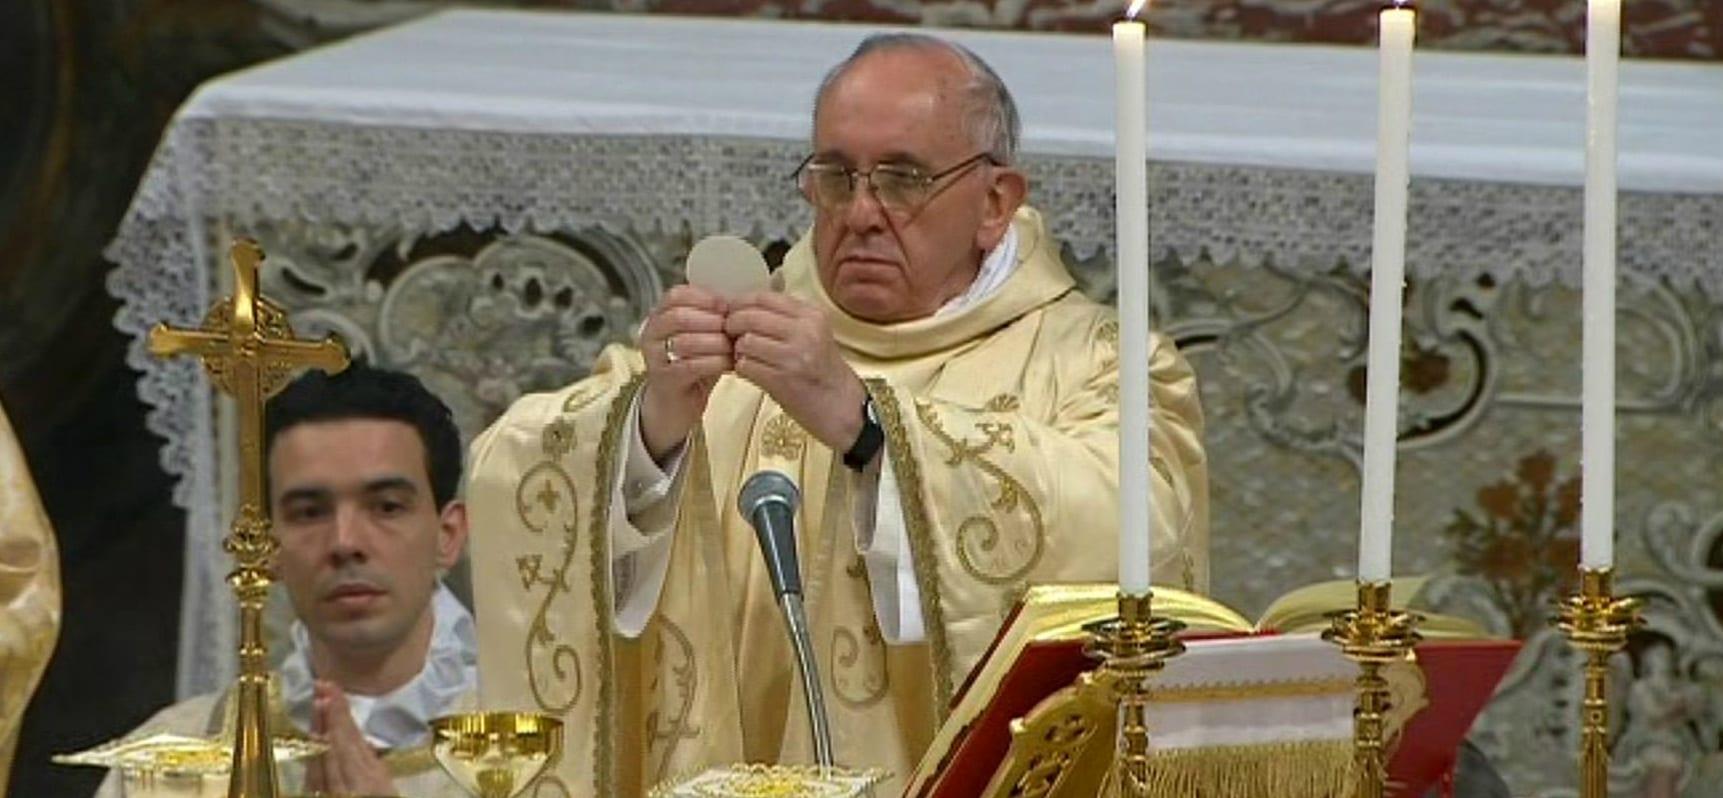 understanding the mass real presence priest people discerning the body comprendere la messa reale presenza sacerdote persone capire il corpo